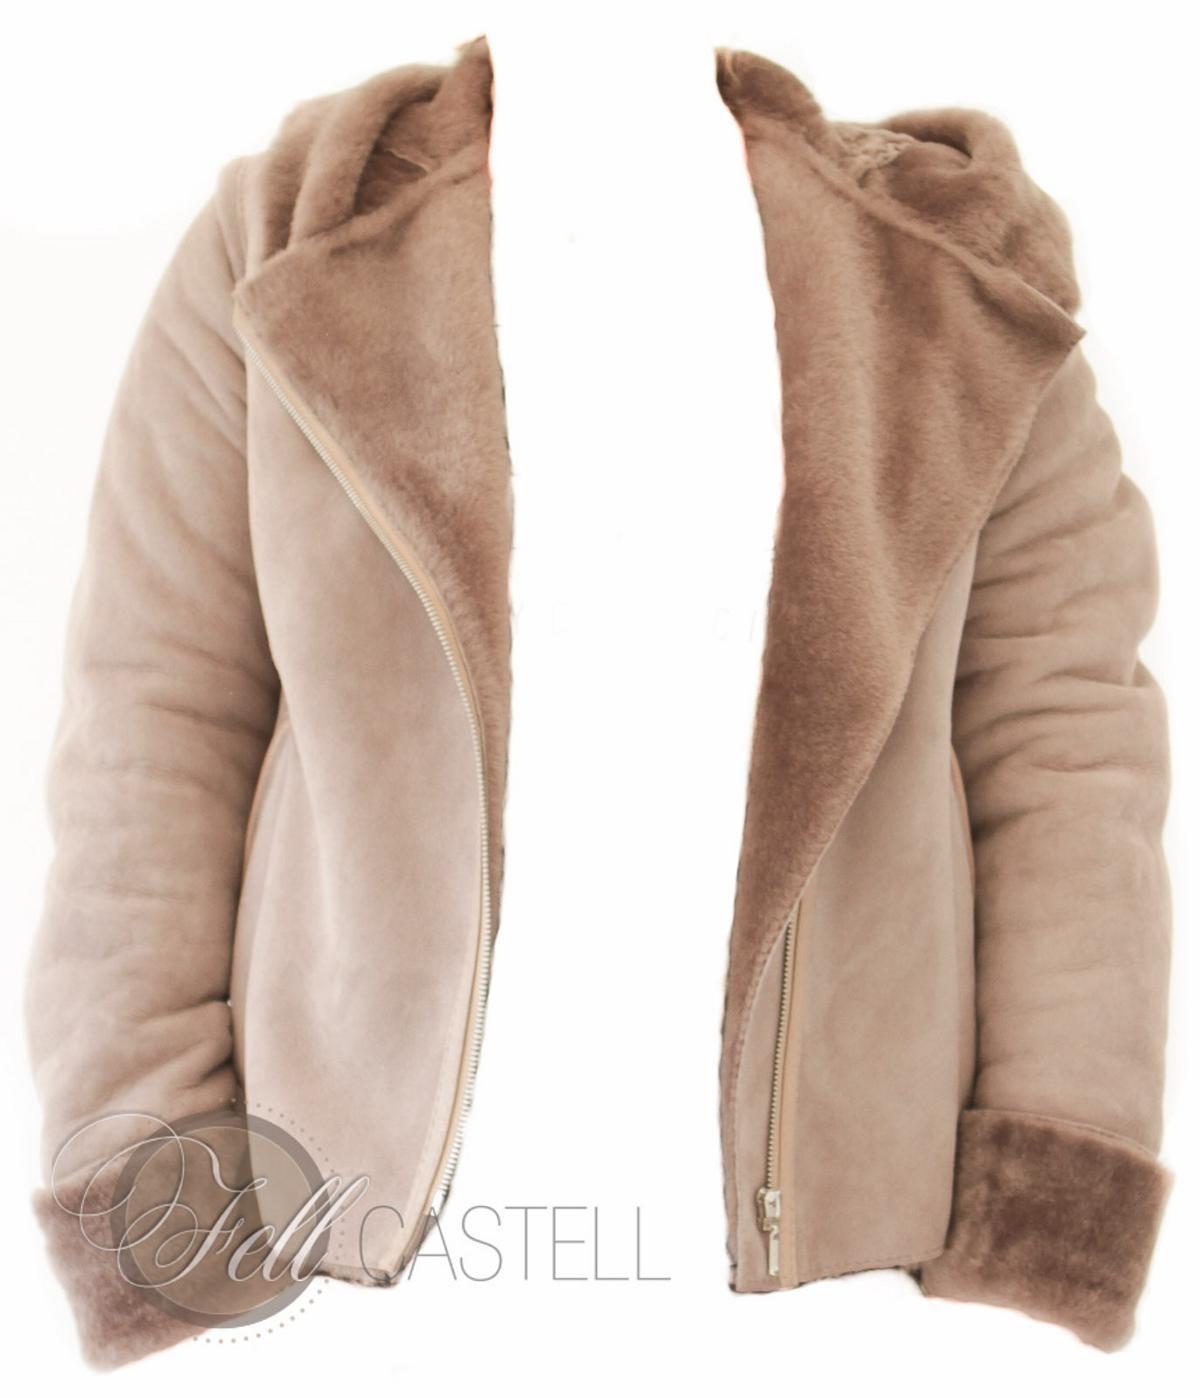 Lammfelljacke Damen Velourleder Beige Fell Braun kurz geschoren Kapuzenjacke mit Reißverschluss 40 / L 40 / L